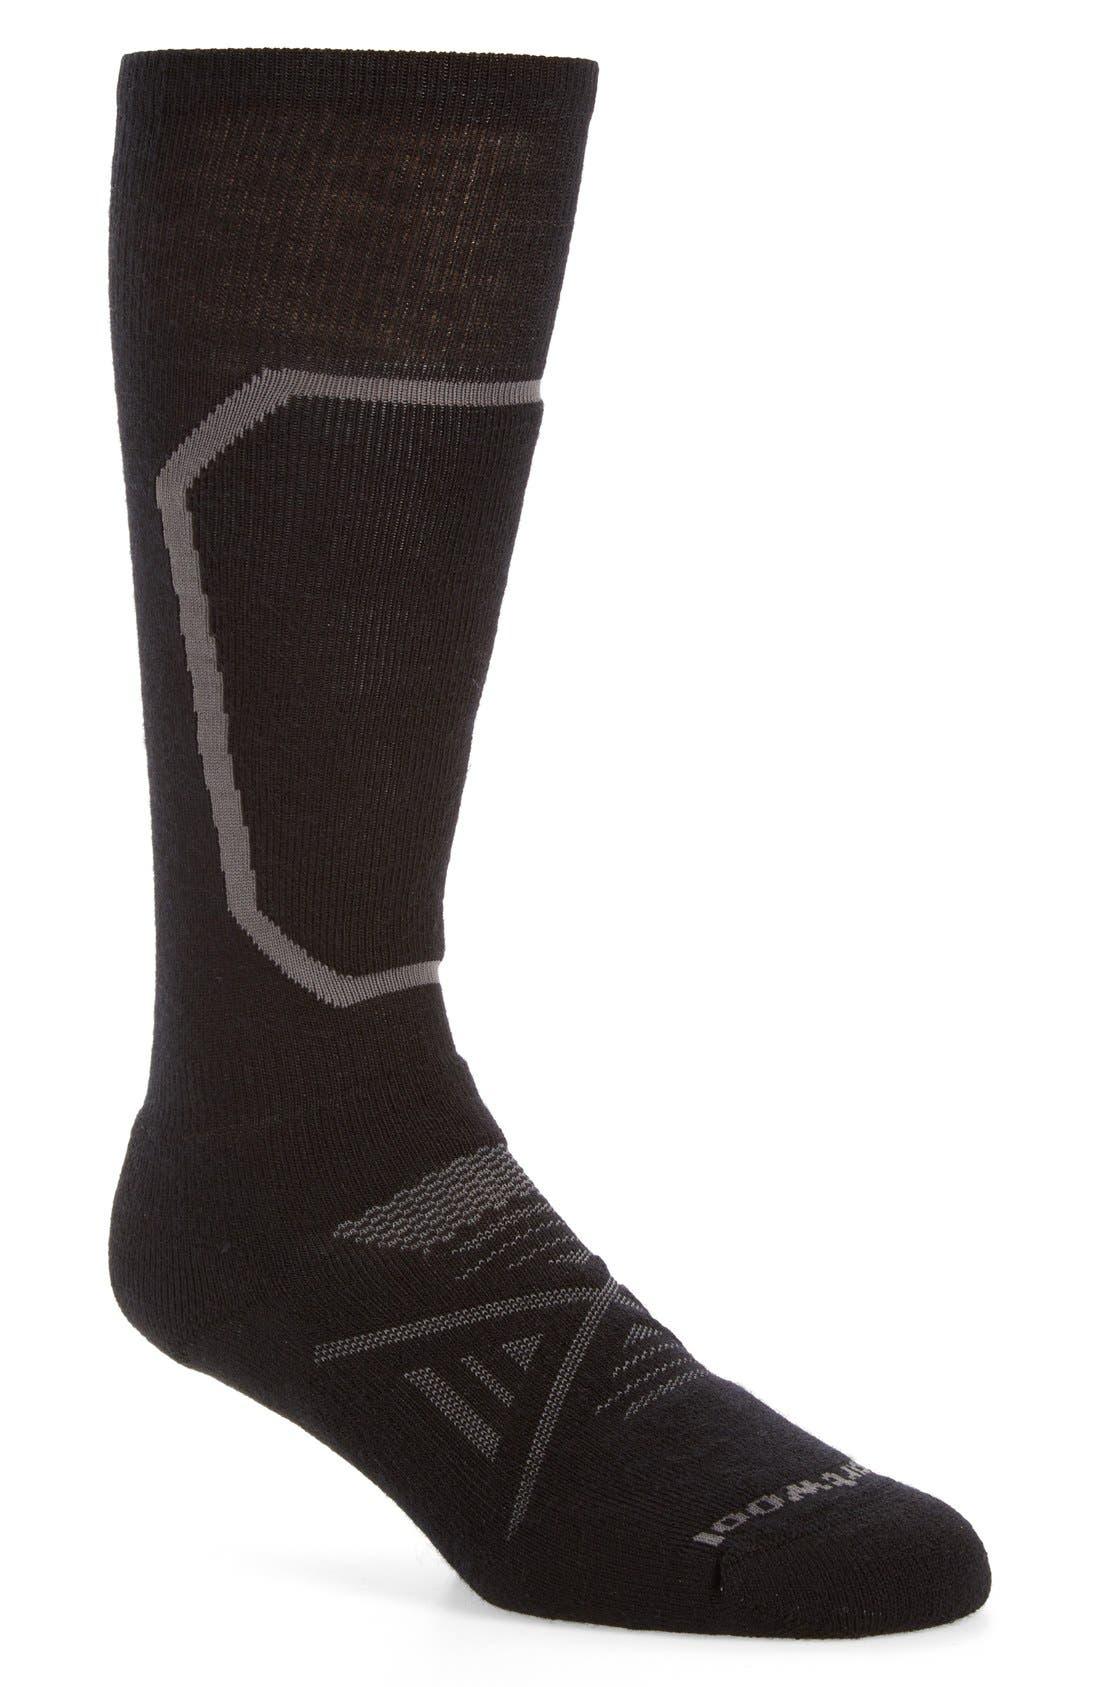 Alternate Image 1 Selected - Smartwool PhD® Ski Medium Over the Calf Socks